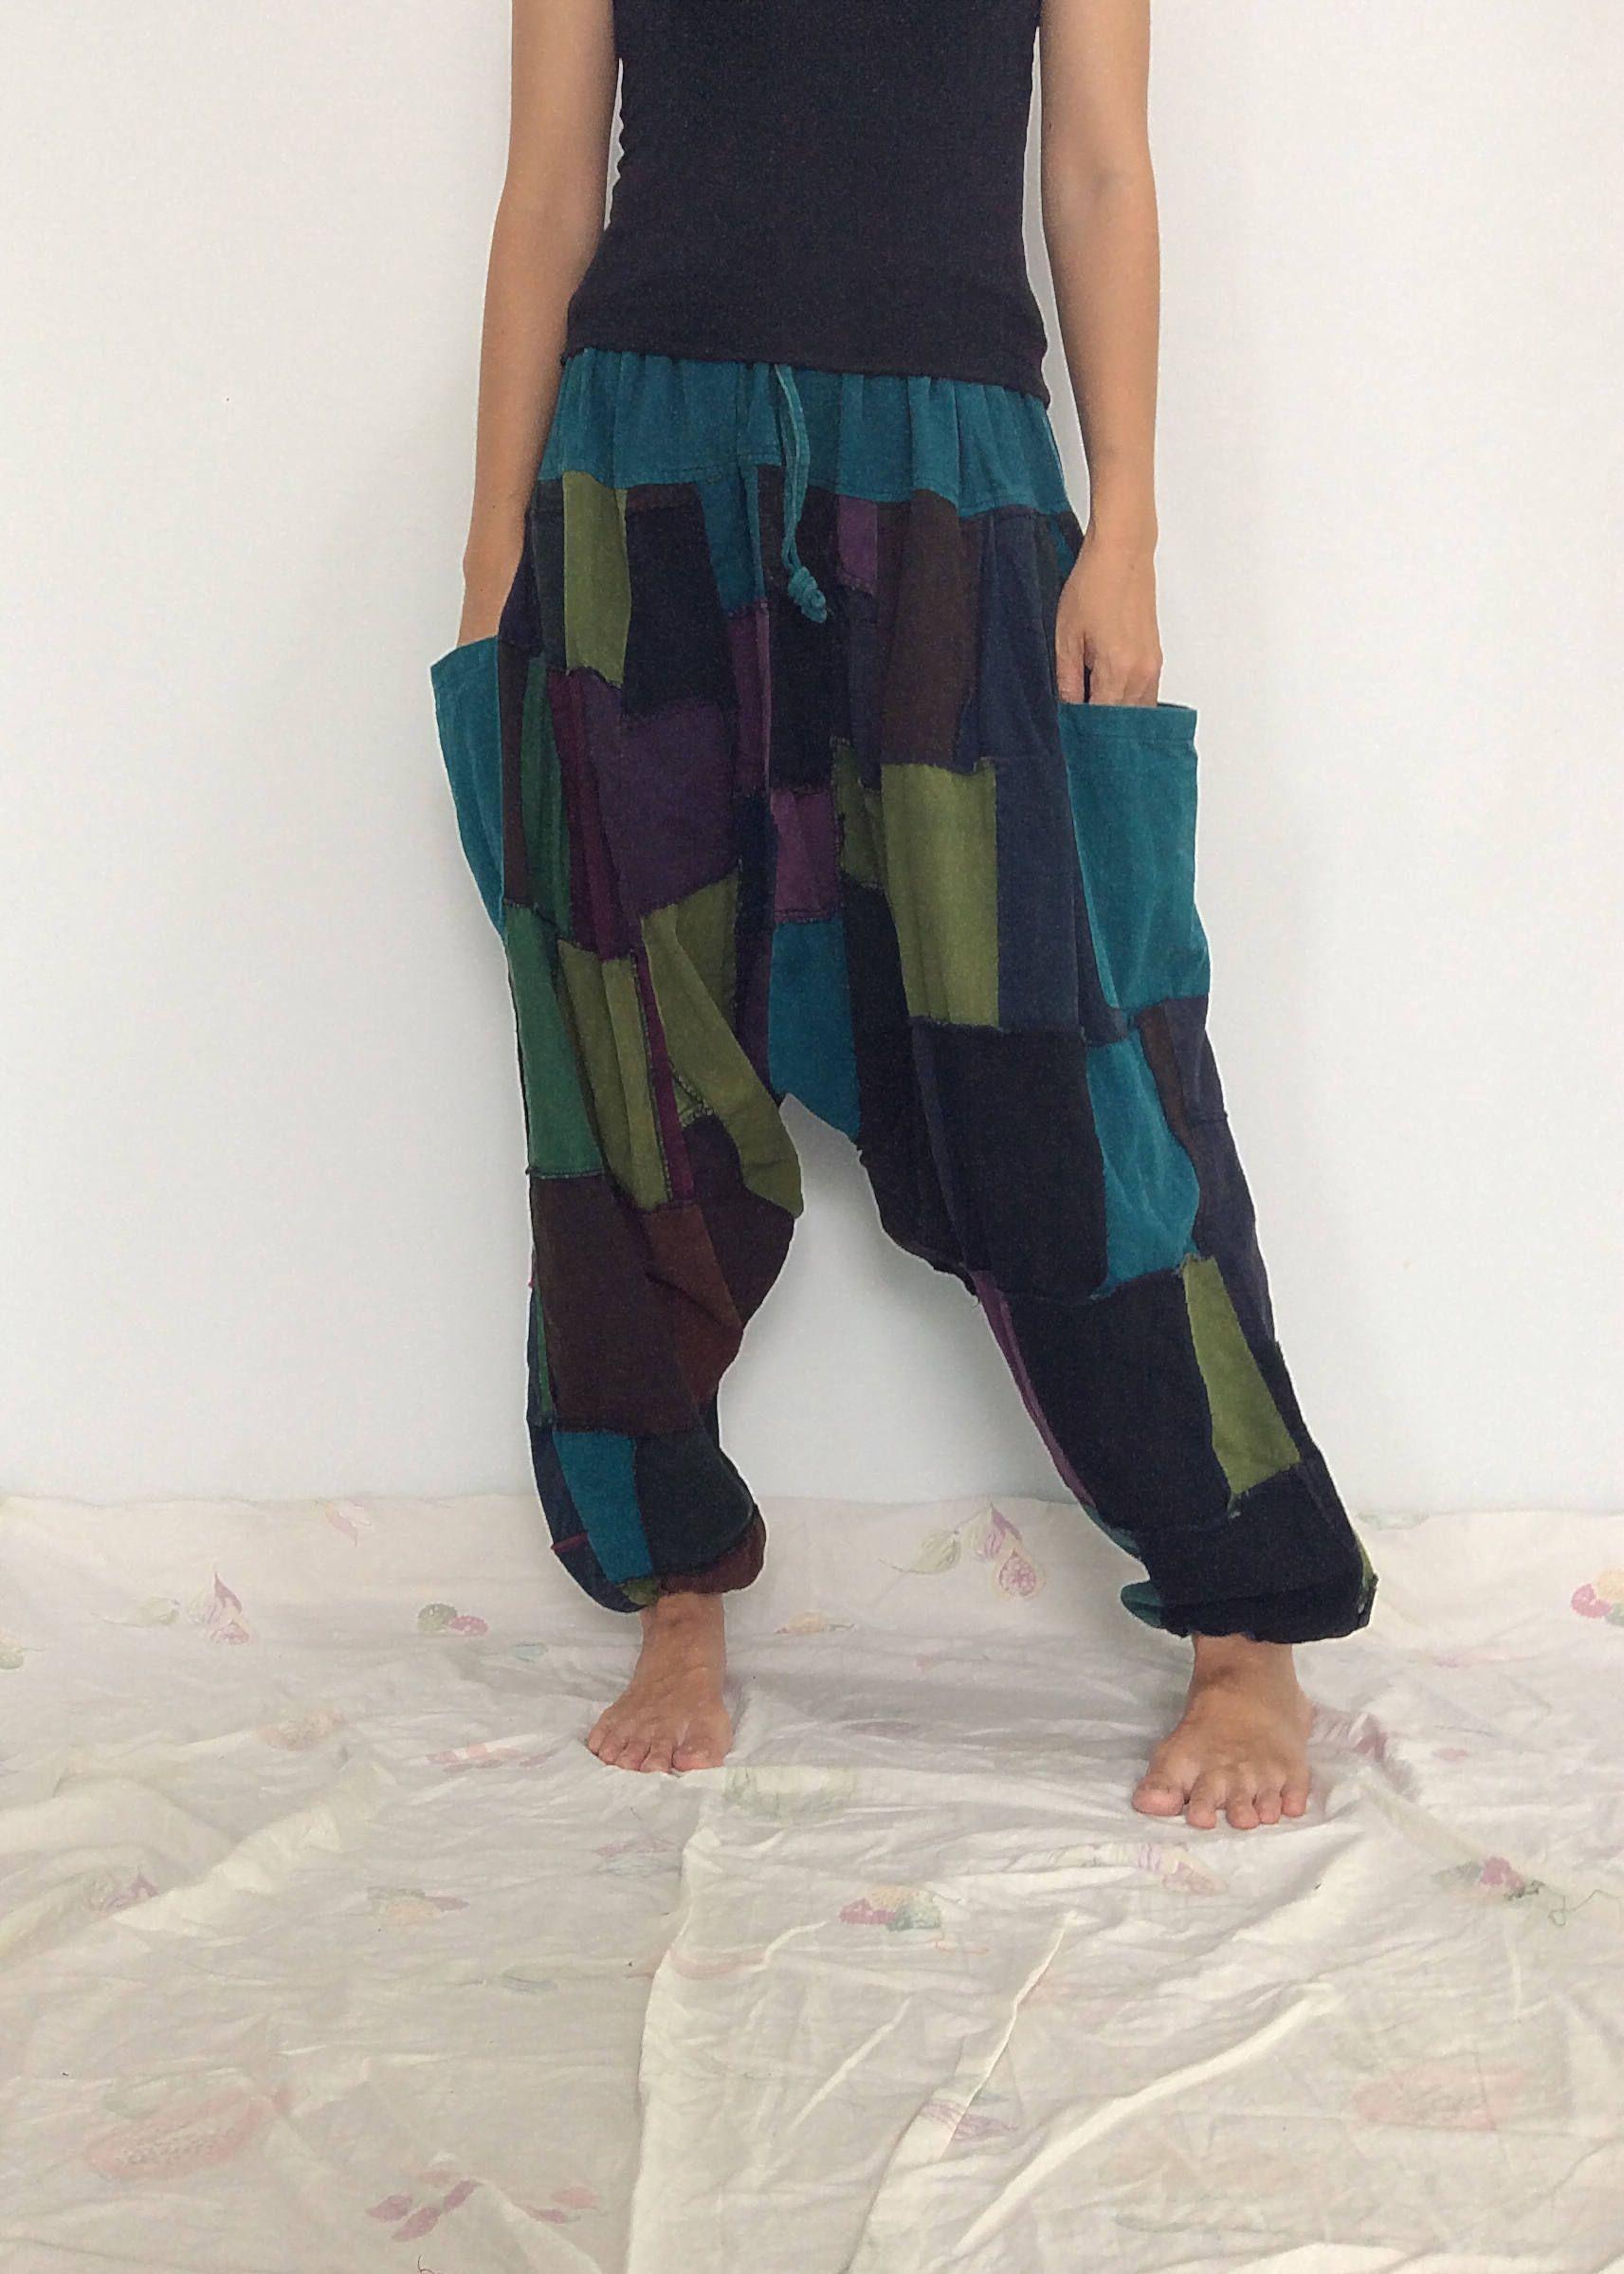 Bohemian Gypsy Harem Pants